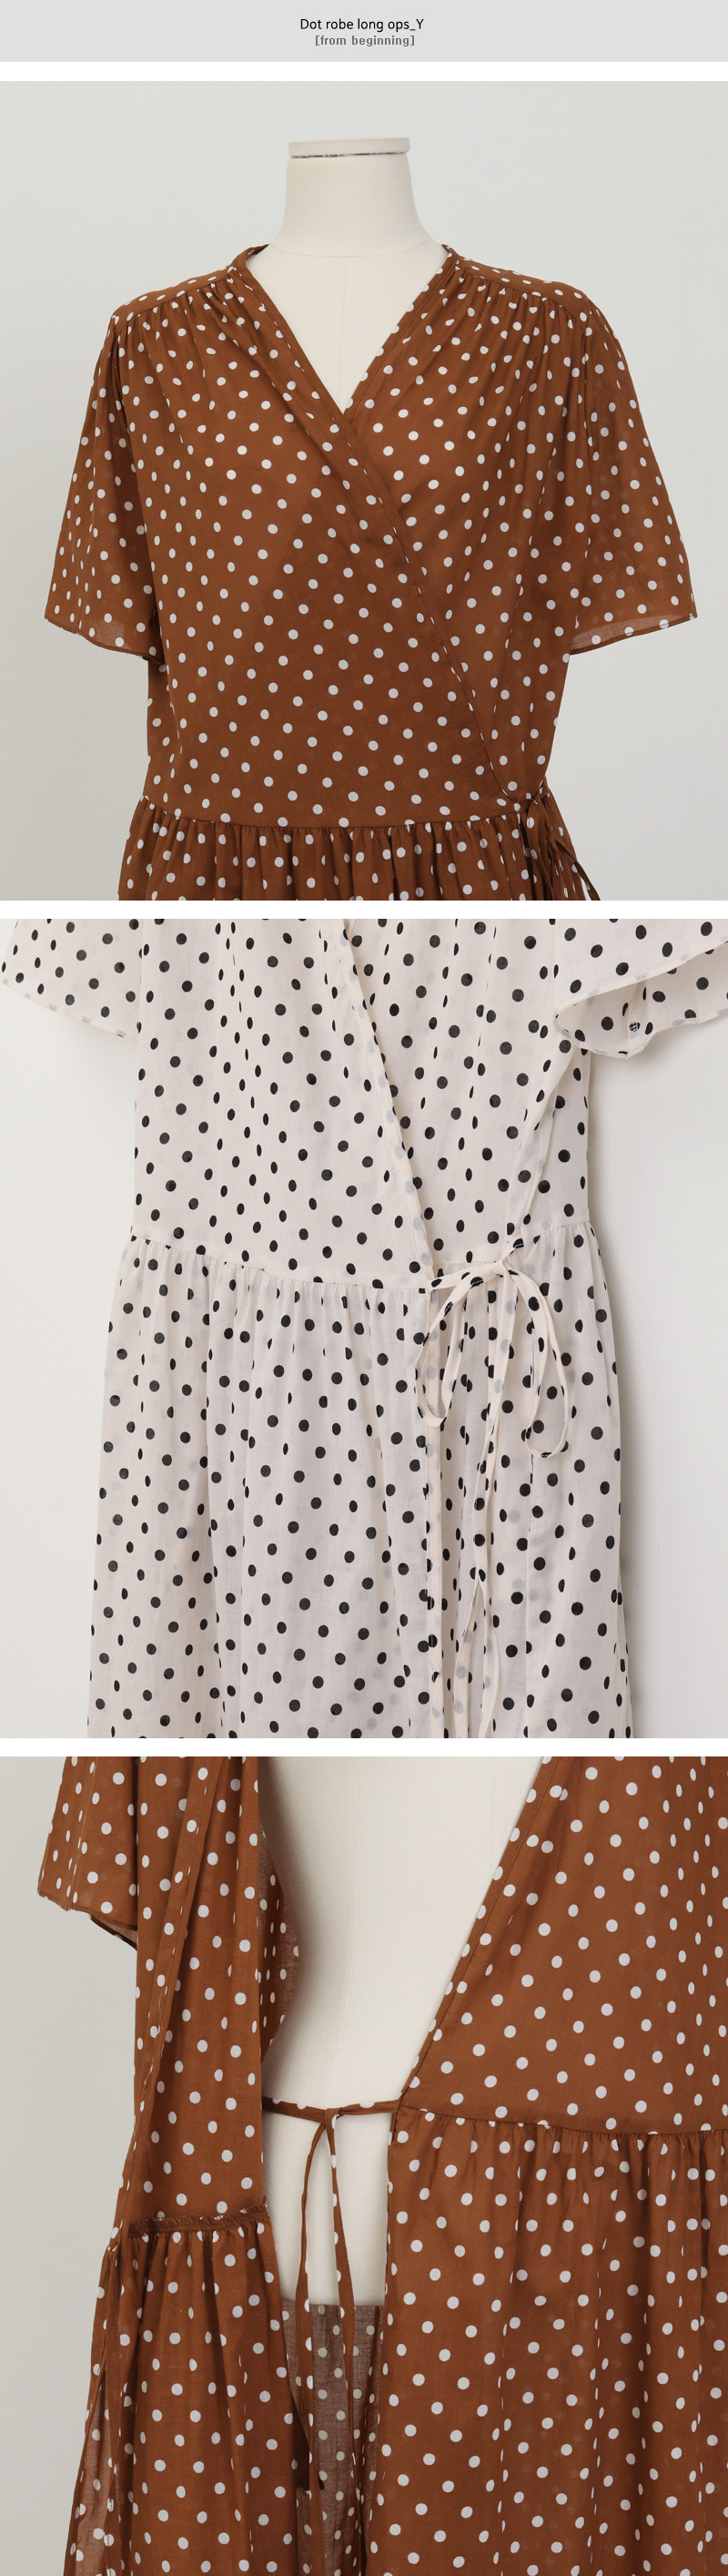 Dot robe long ops_Y